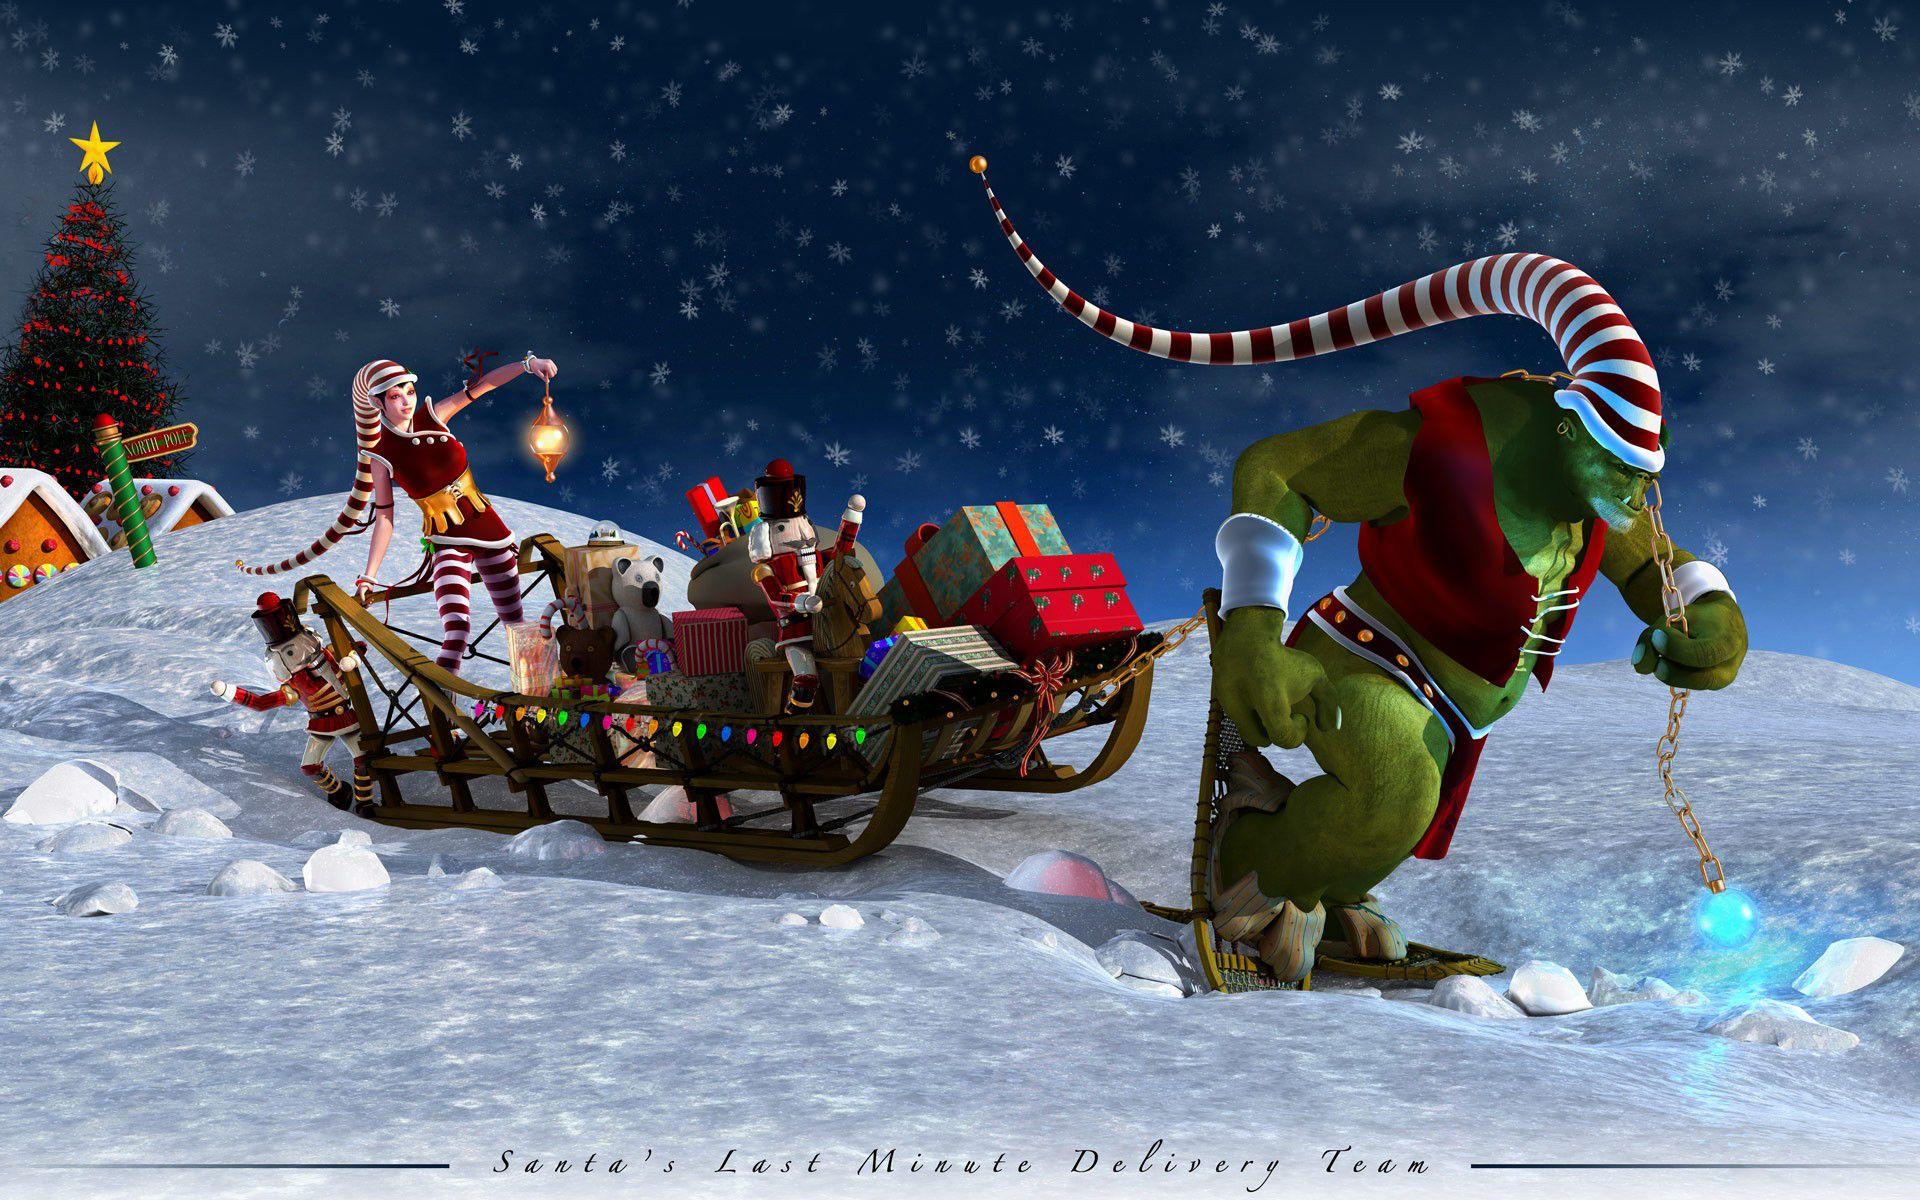 Pin By Mish Sublett On Christmas Cute Christmas Wallpaper Christmas Desktop Wallpaper Christmas Desktop